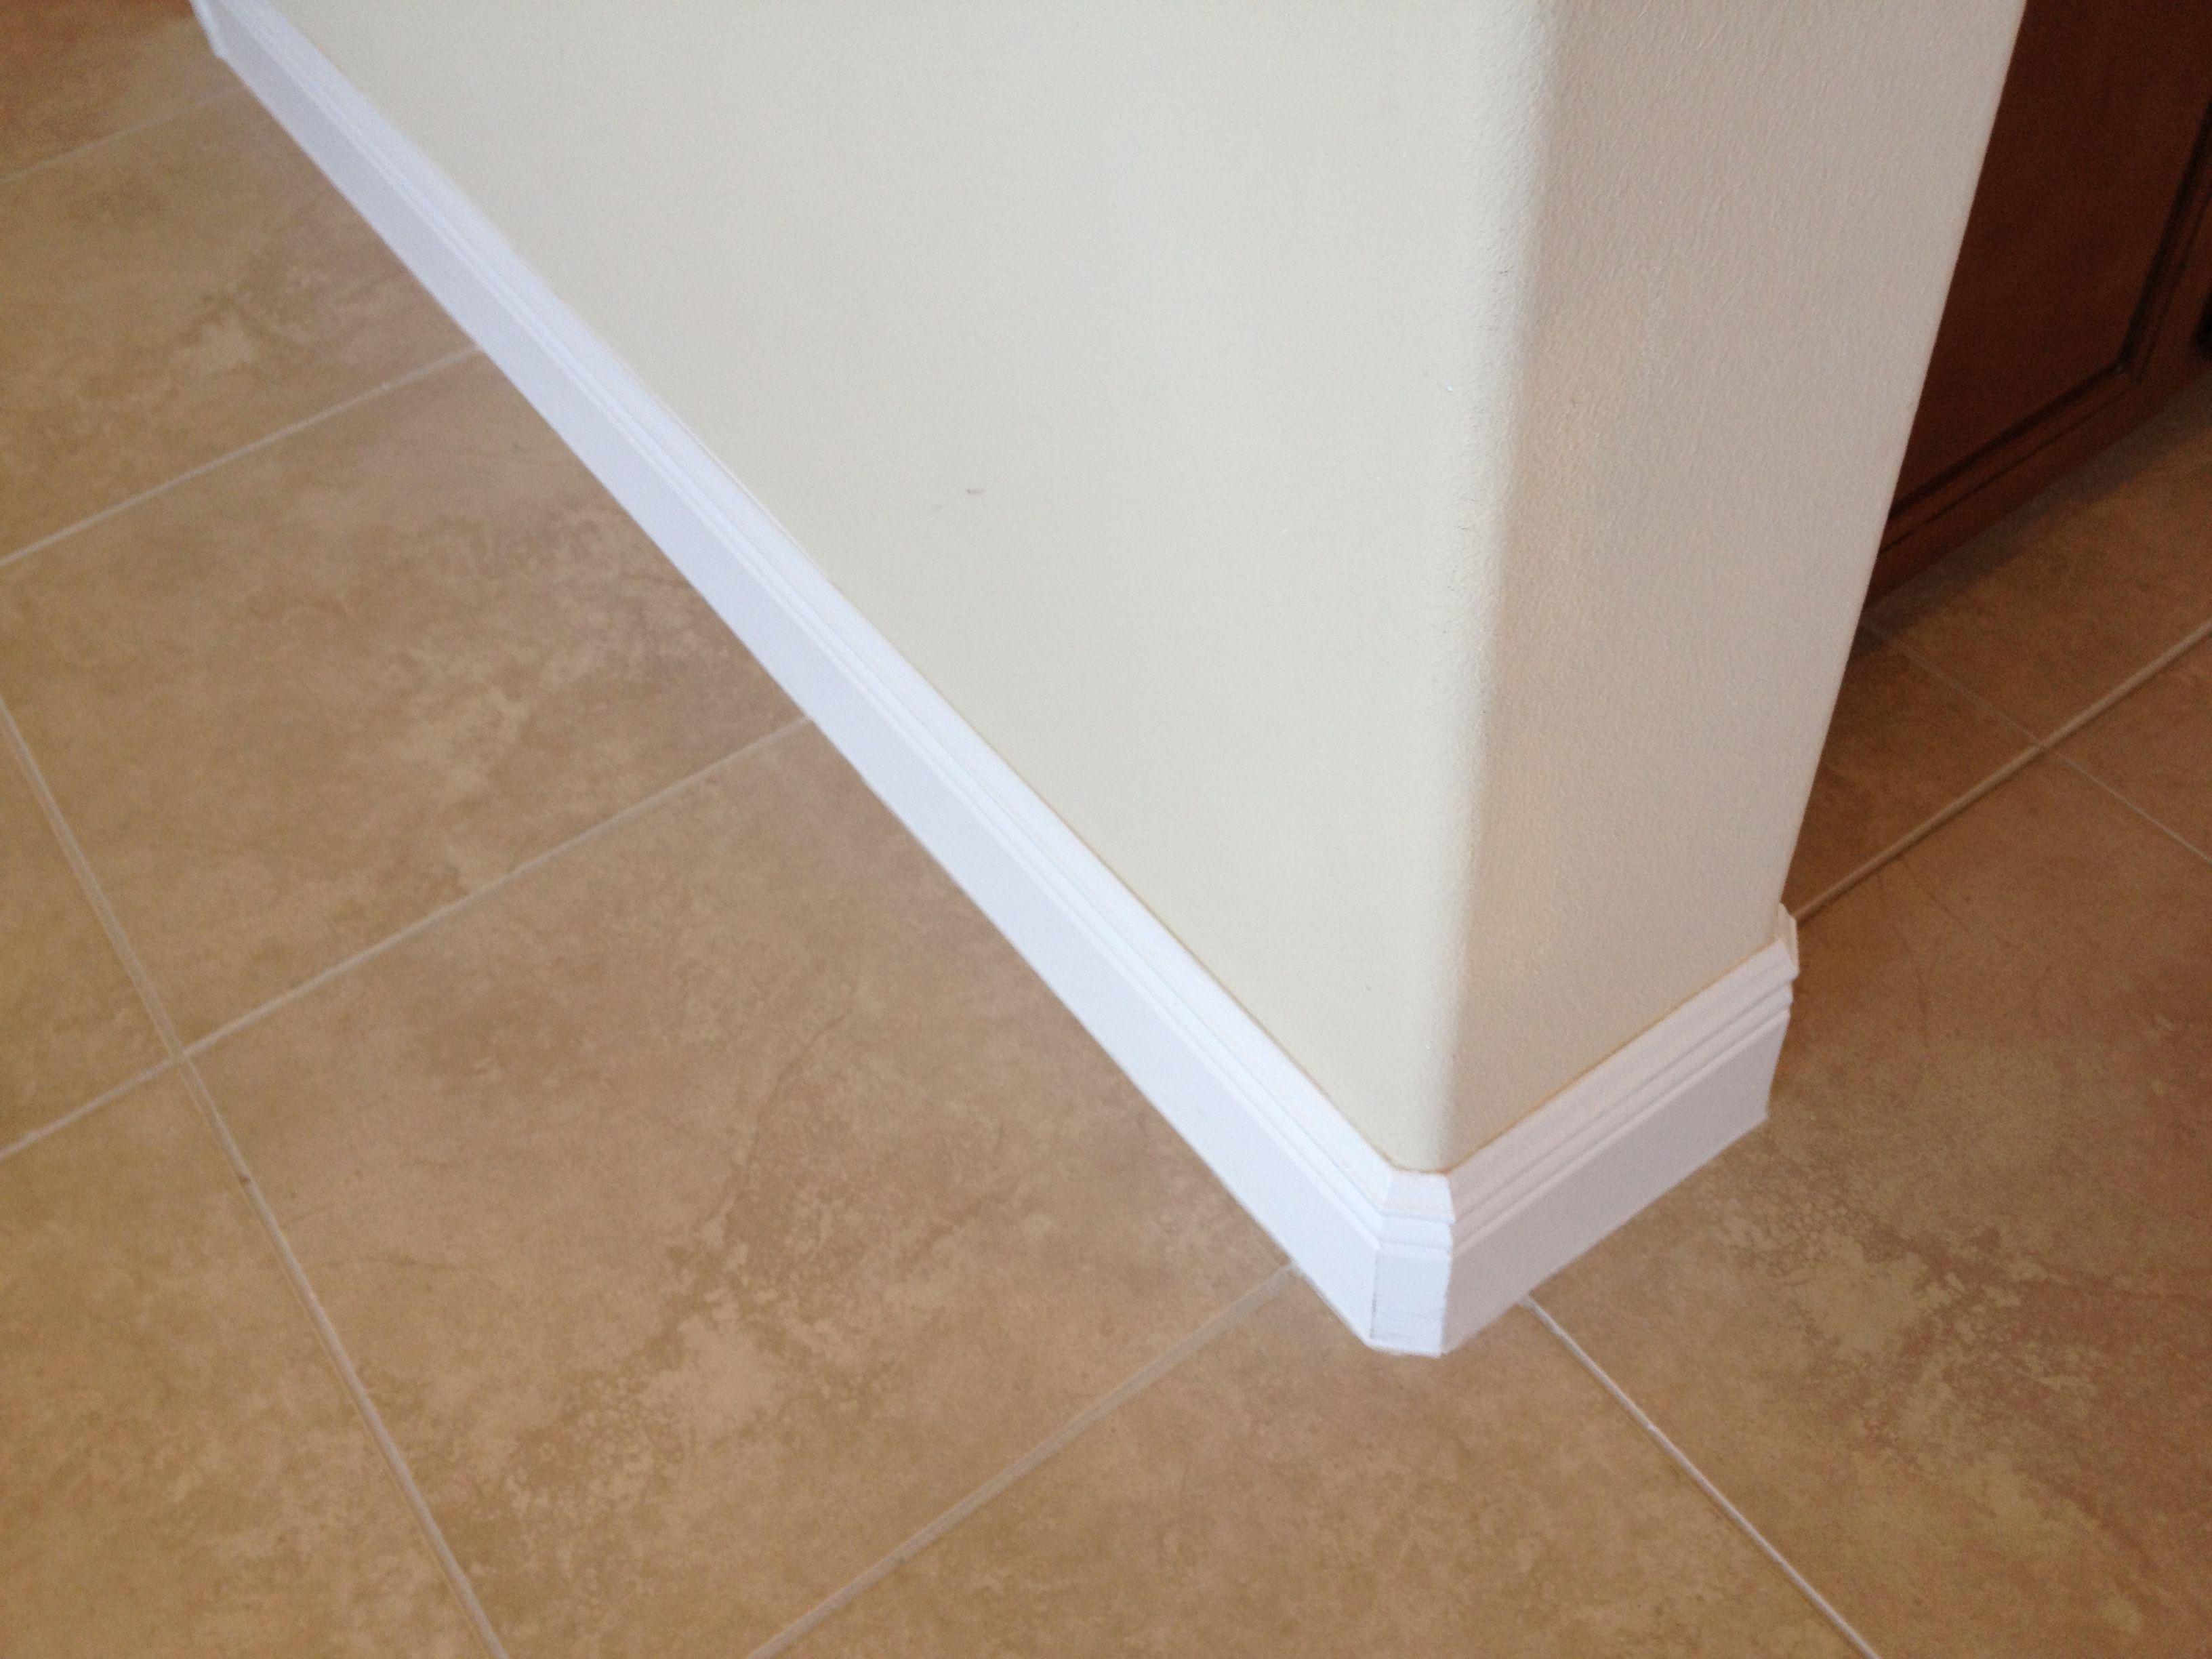 5 14 Baseboard And Tile Flooring Carmel Grande 12 Pinterest